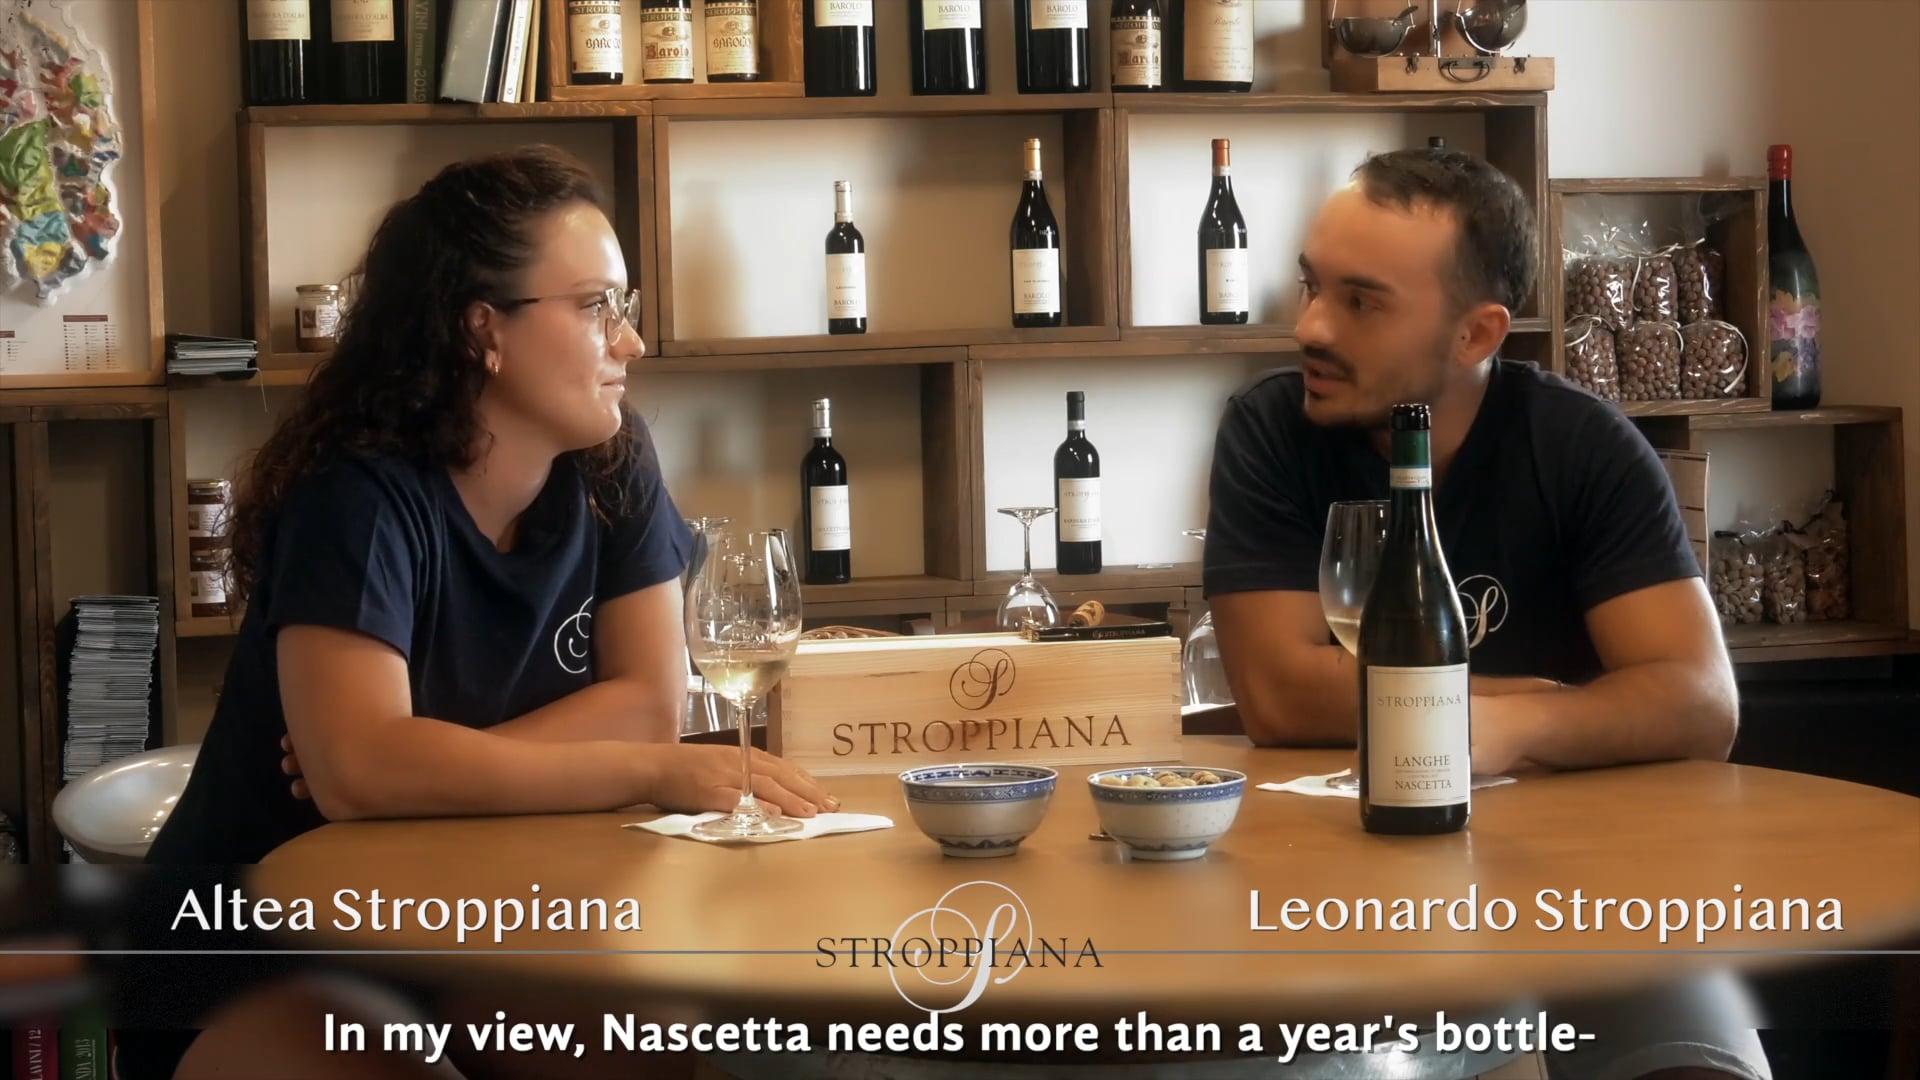 Cantina Stroppiana | Altea e Leonardo